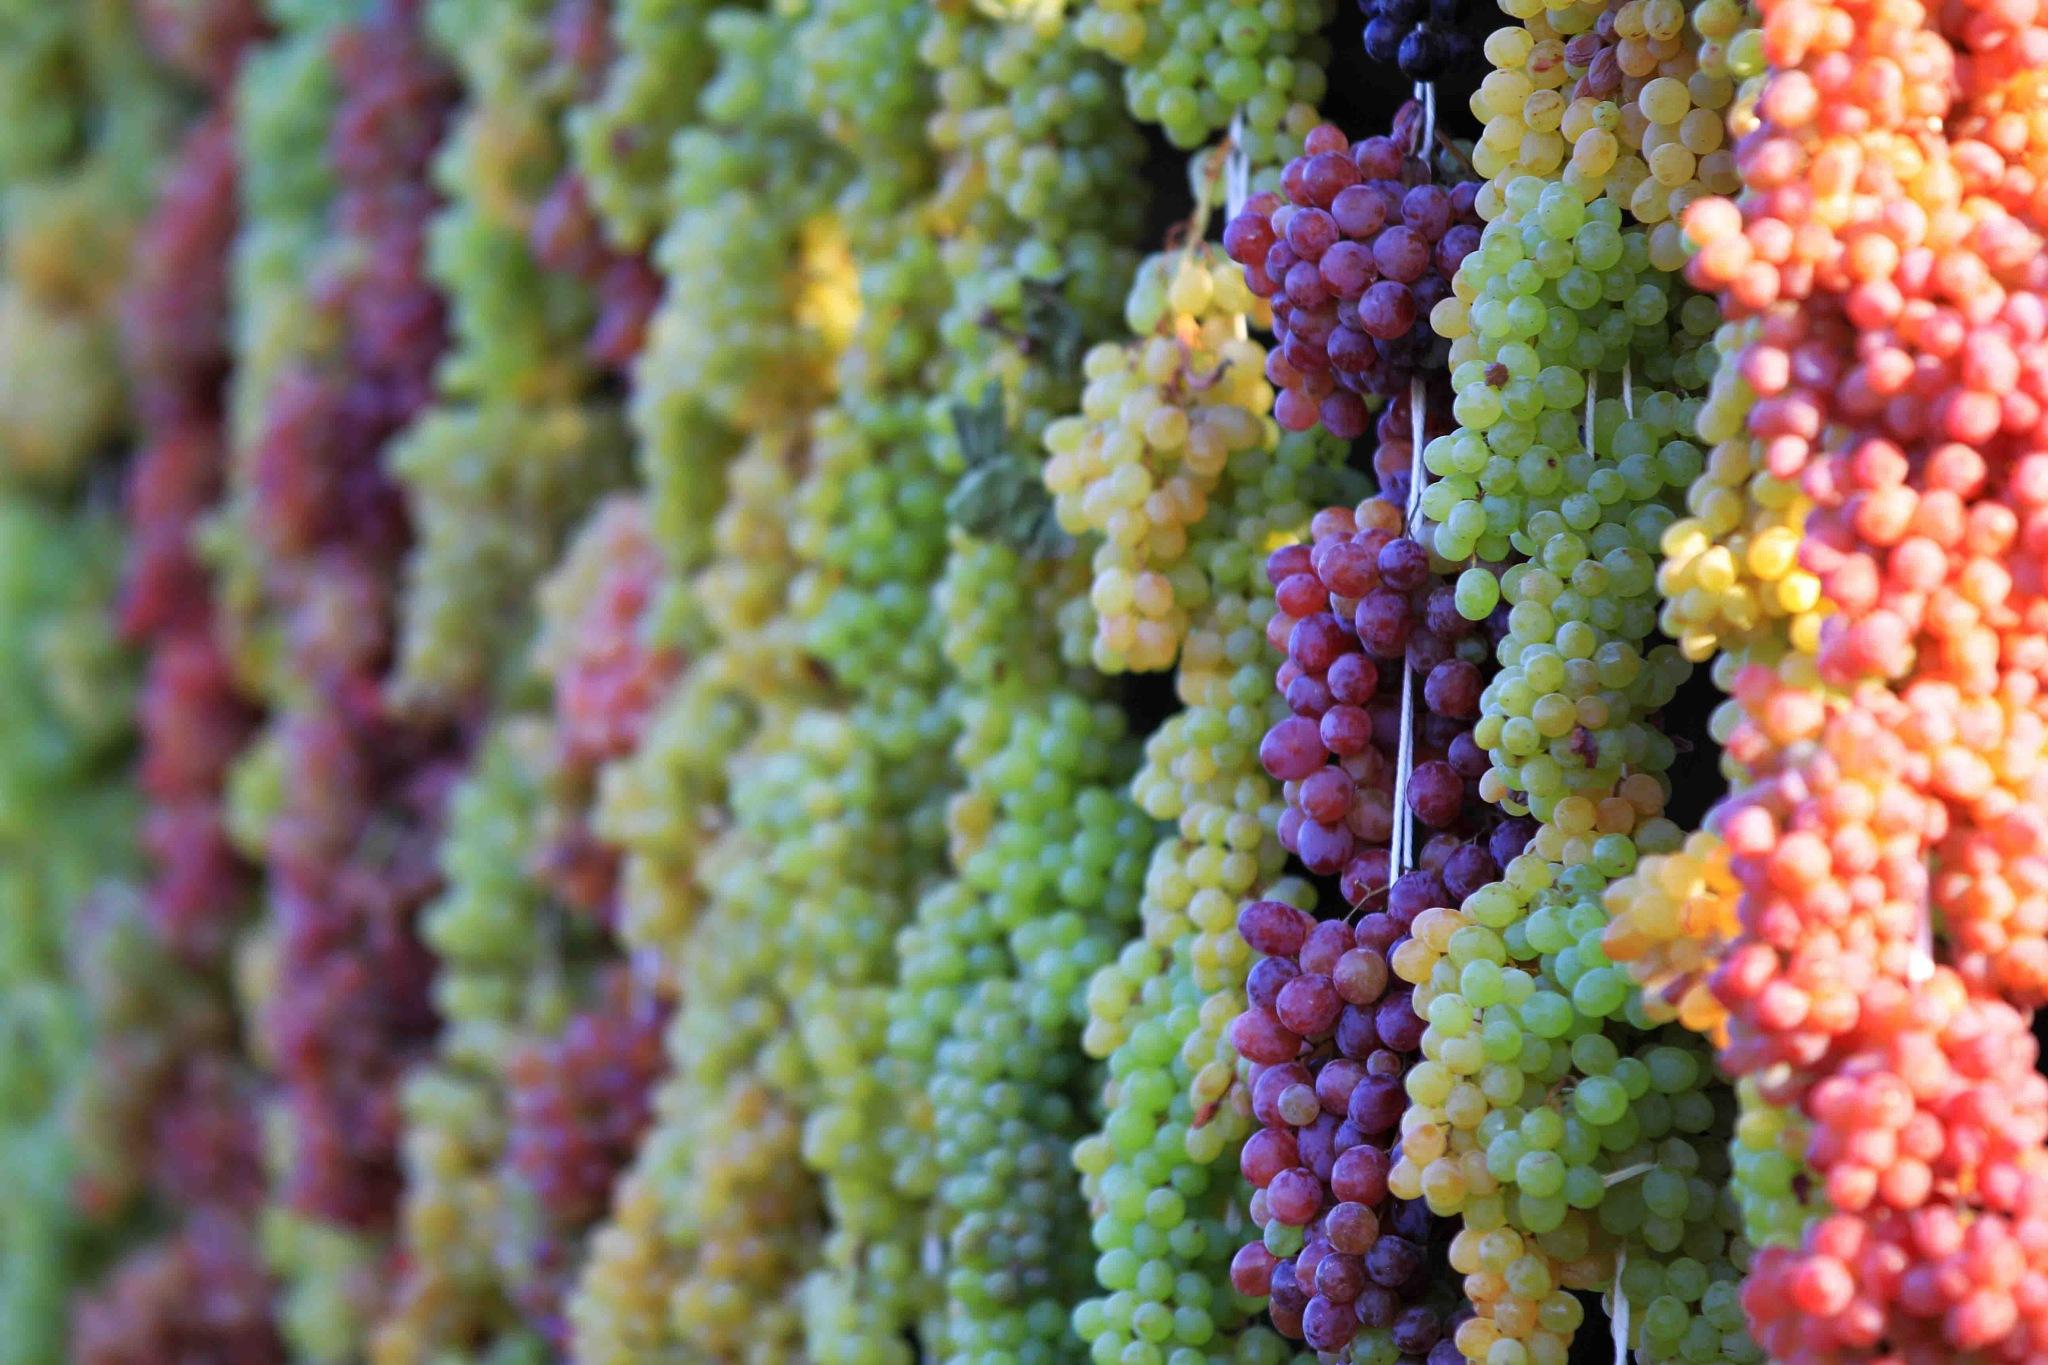 رنگین کمان انگور by kavoshihs